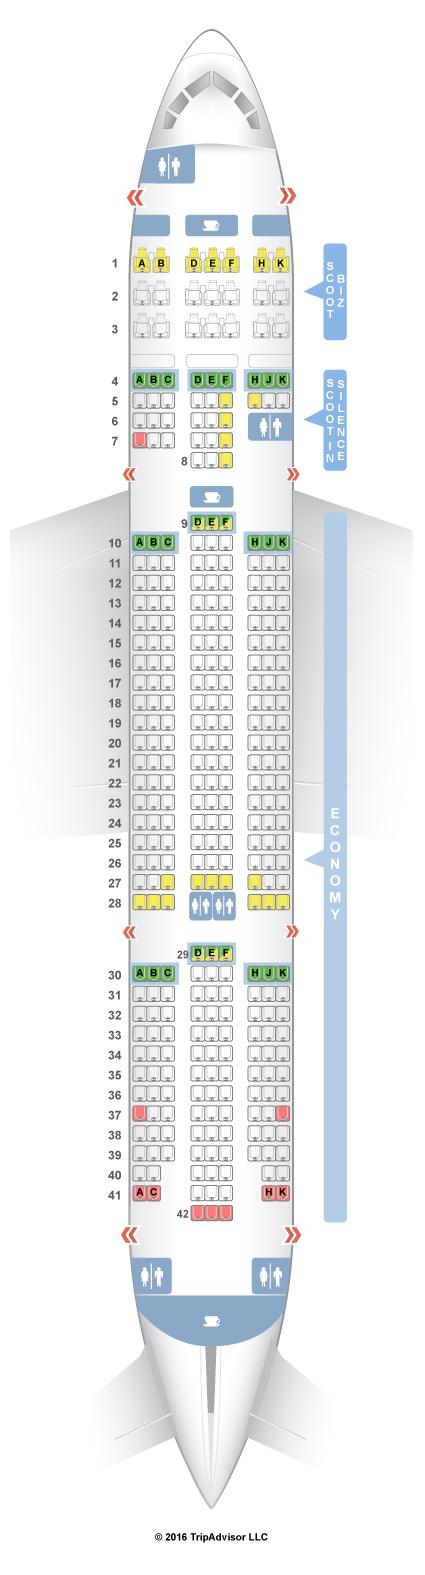 Seatguru Seat Map Scoot Airlines Boeing 787 800 788